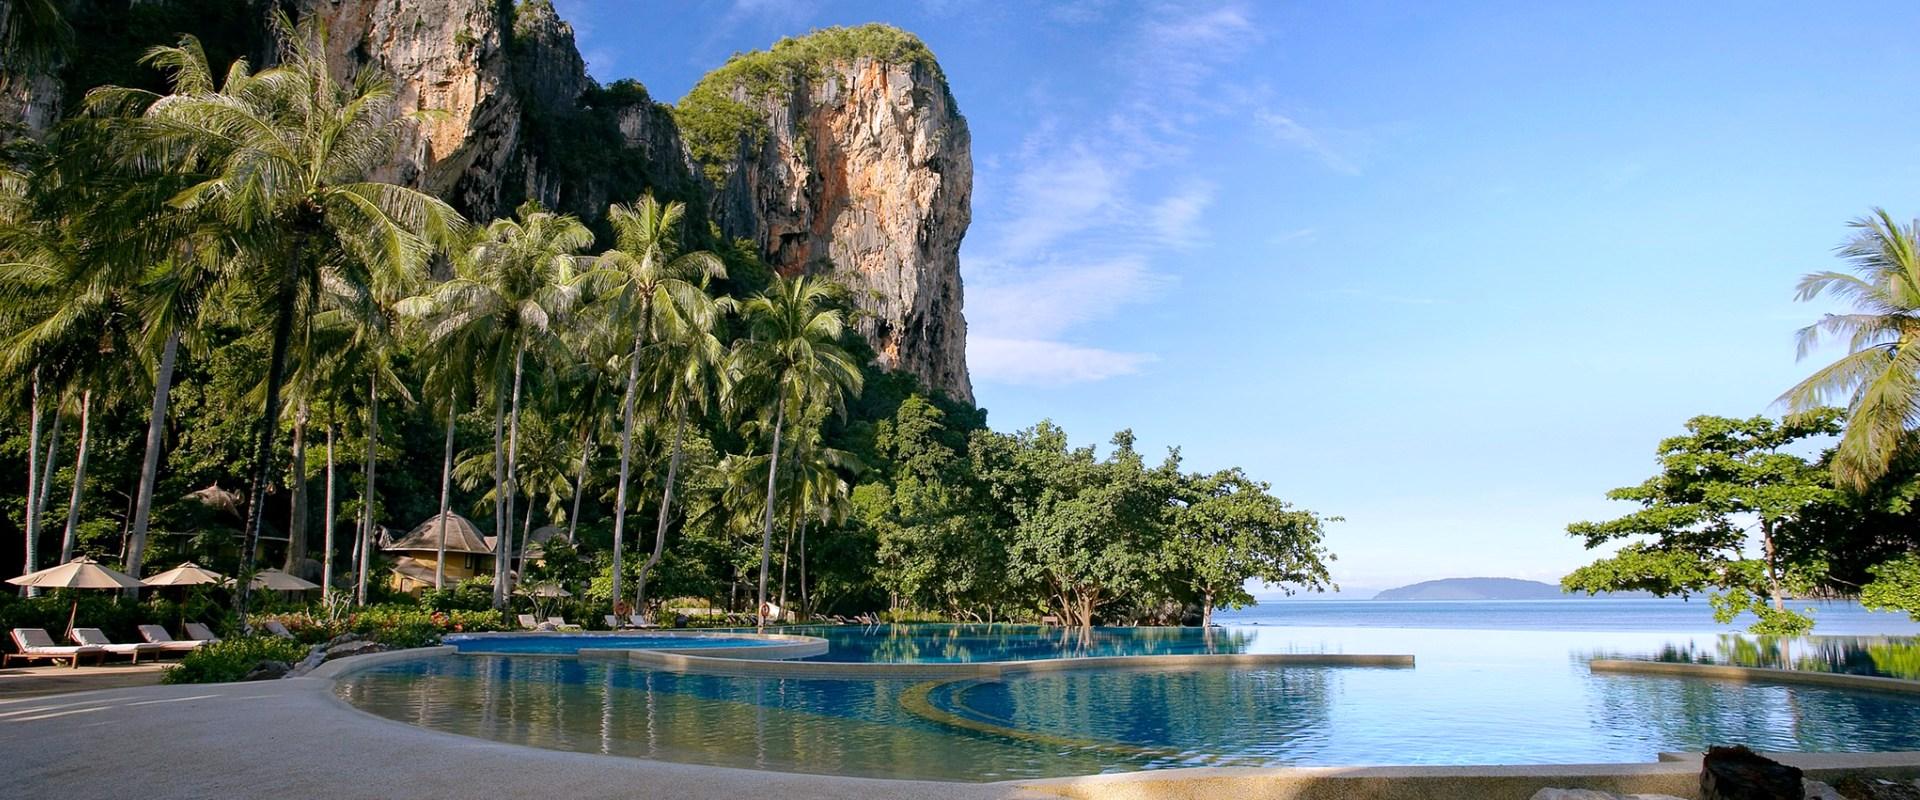 krabi-rayavadee-resort